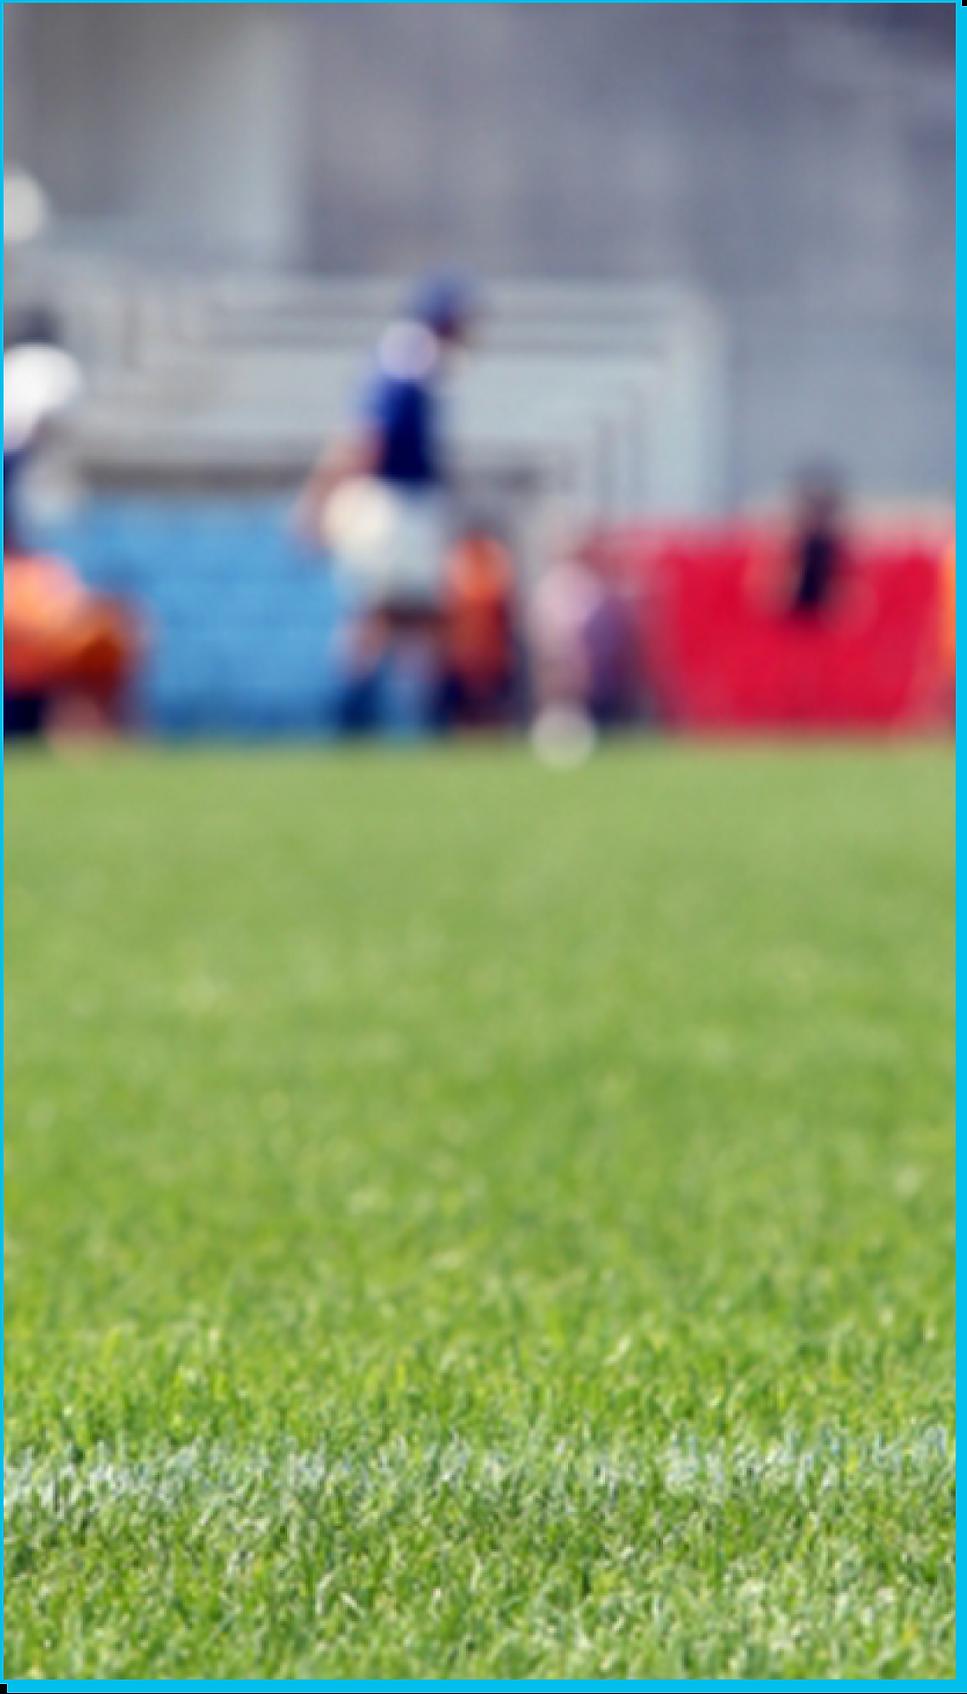 tit_sports_bg.png